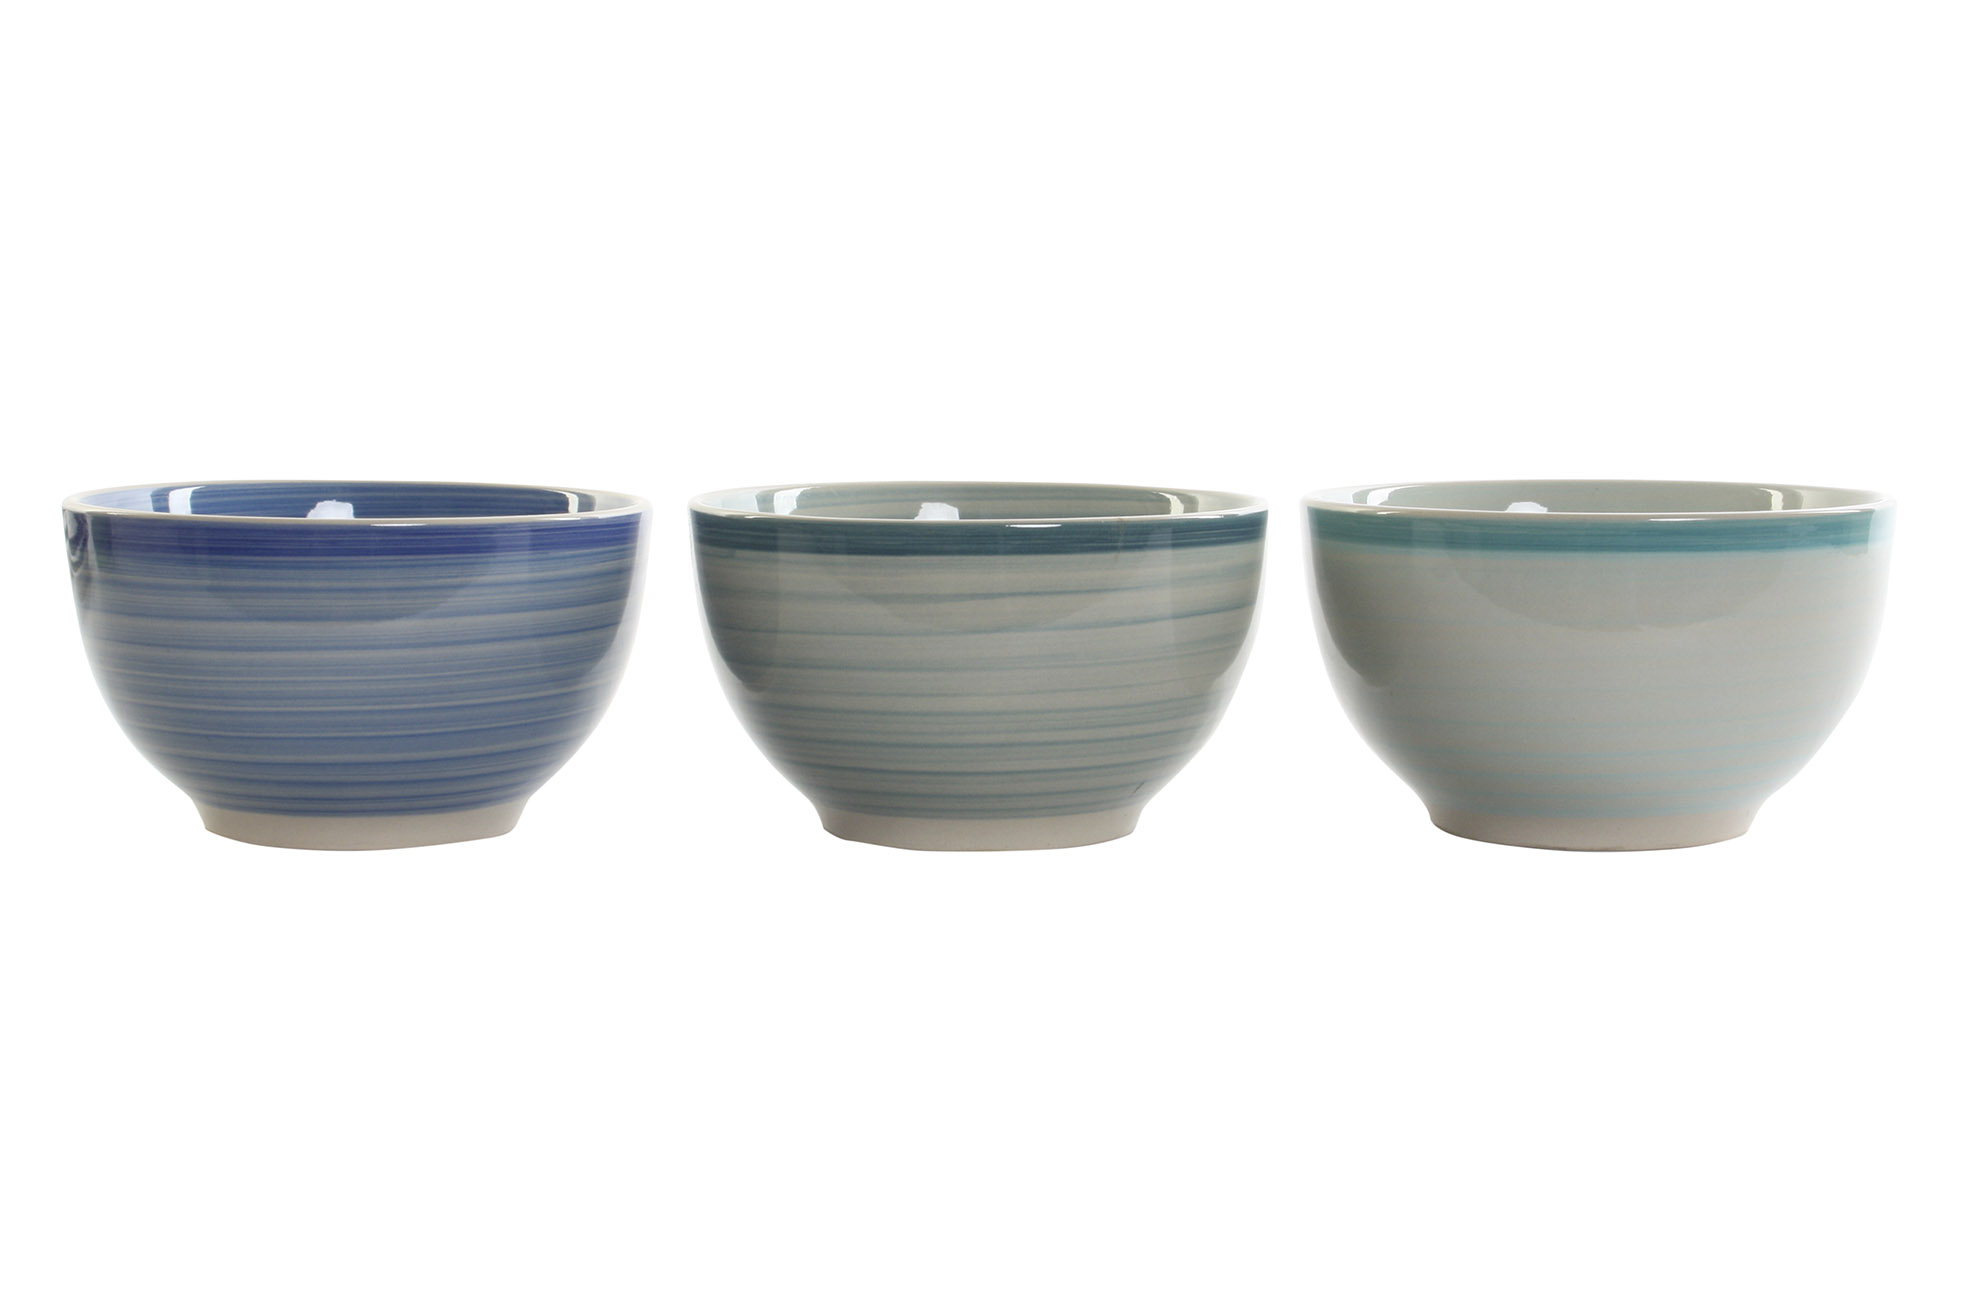 Frokosttallerken i keramik